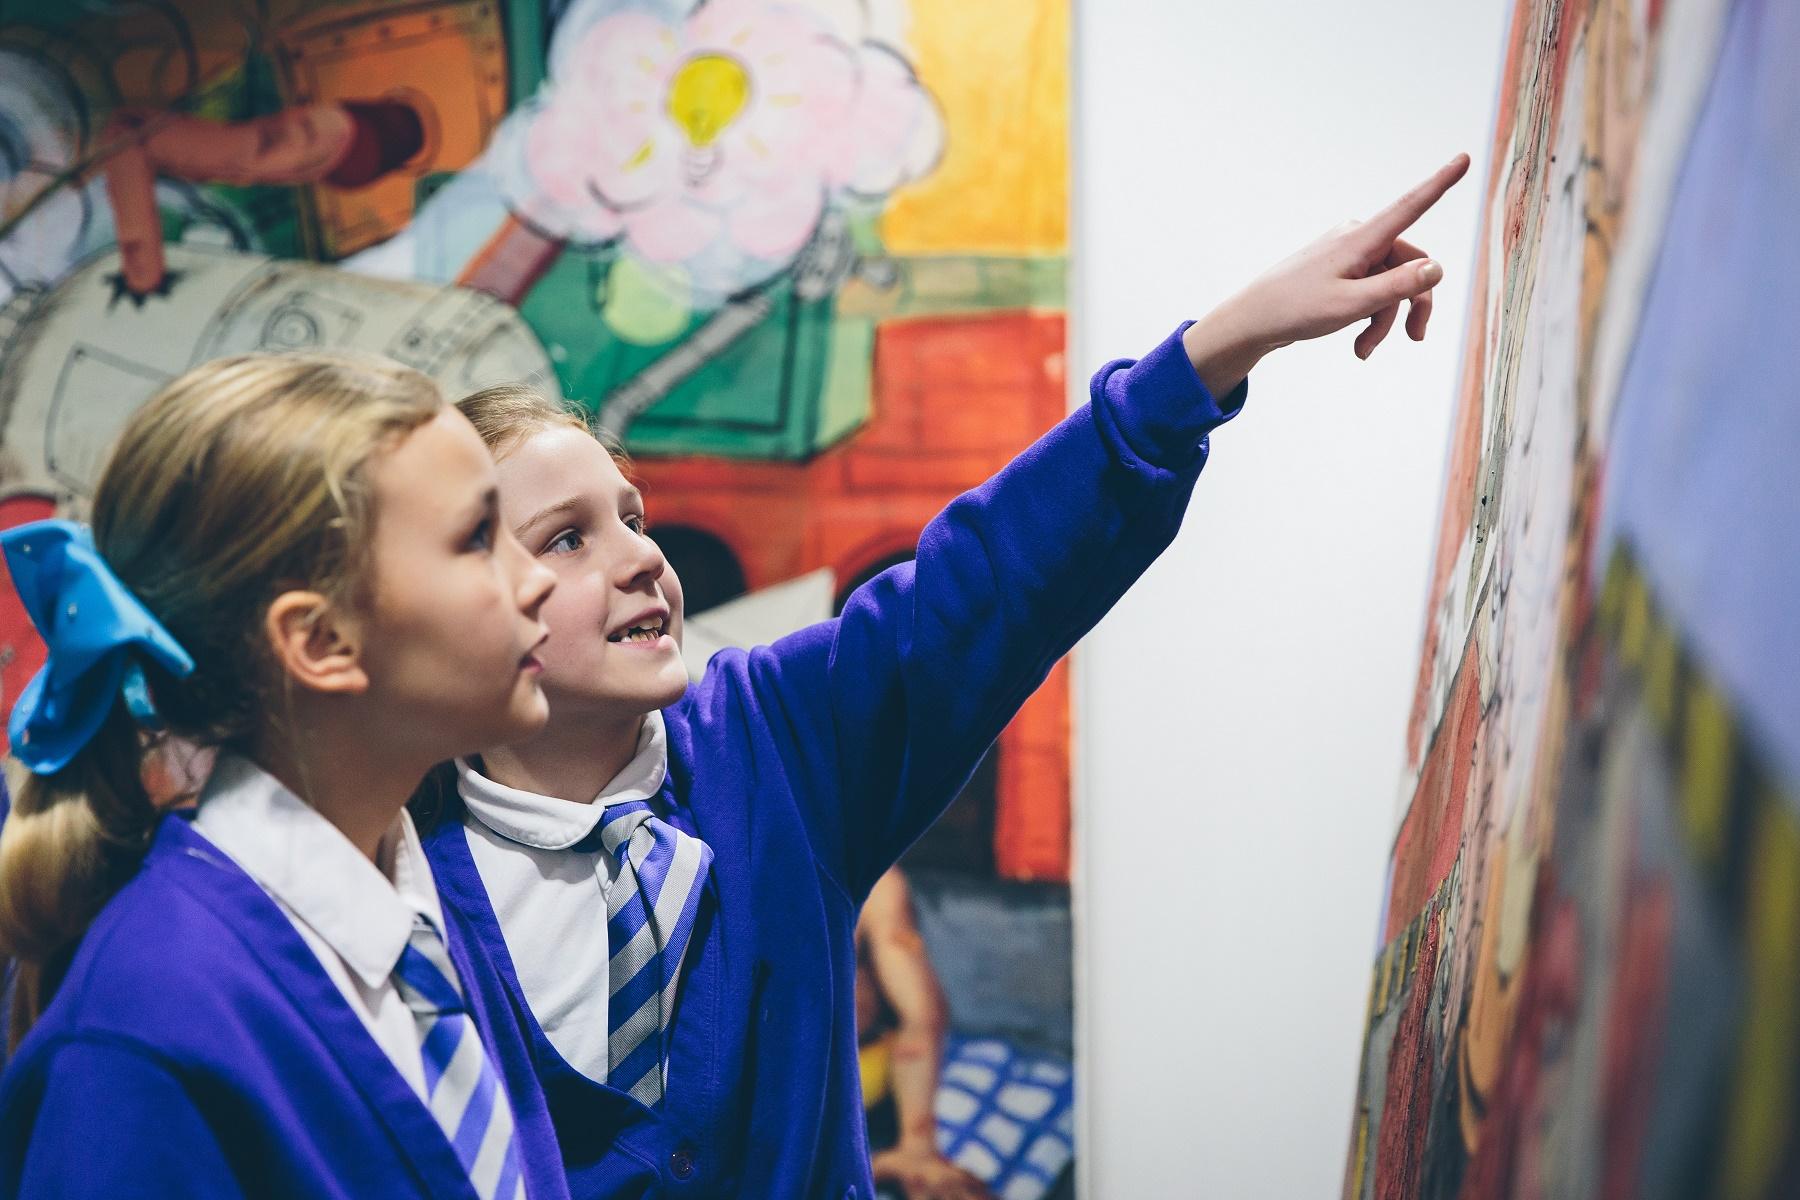 Children look at artwork